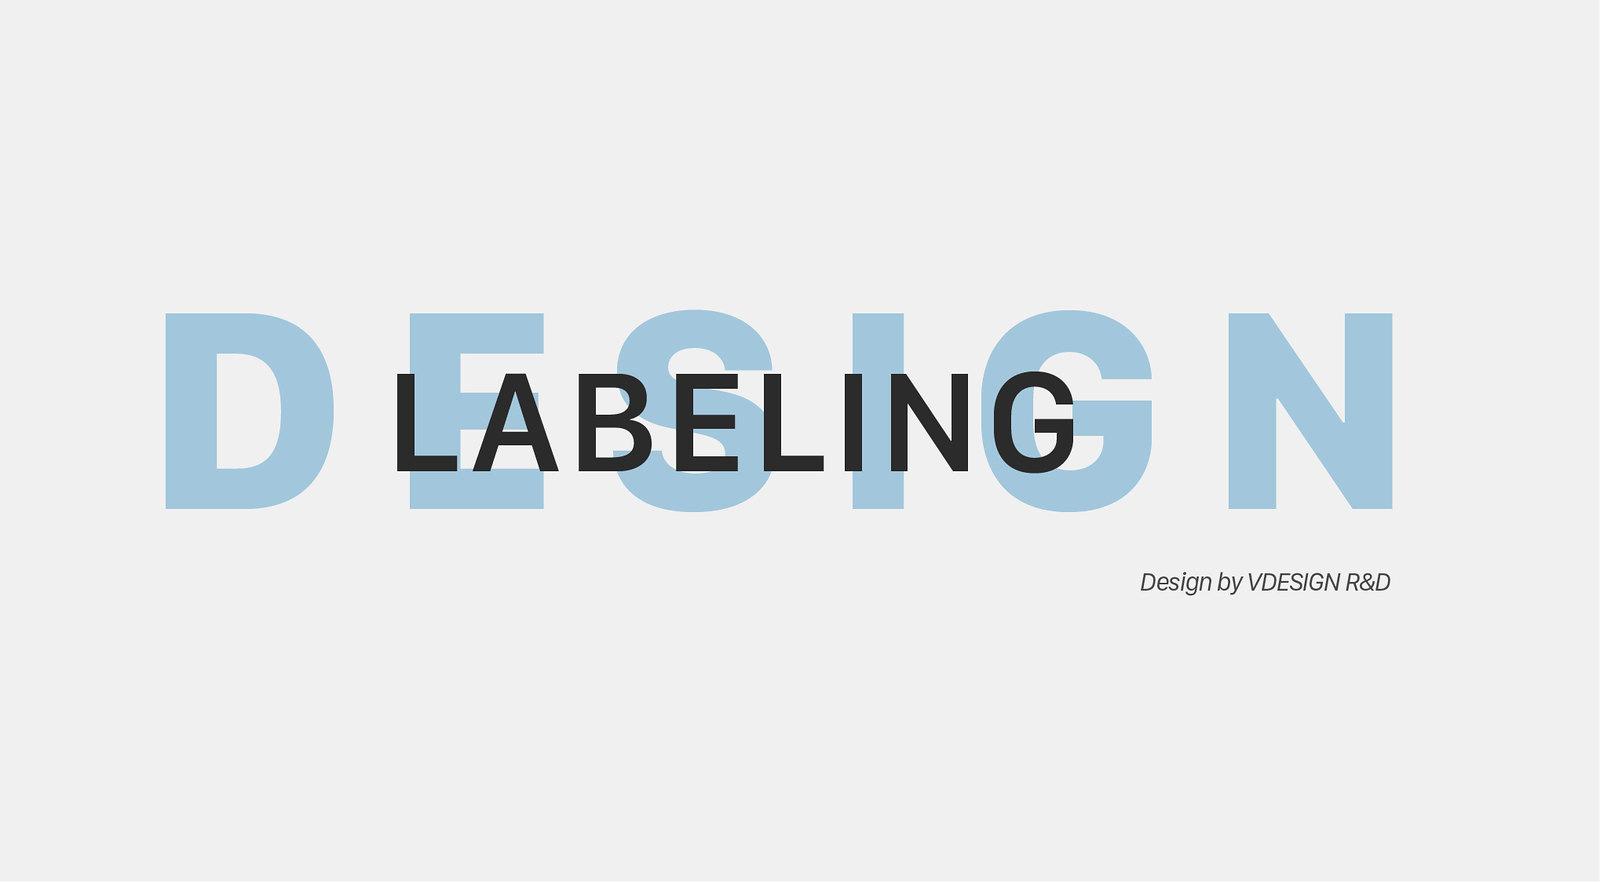 Labeling Design - Vdesign R&D